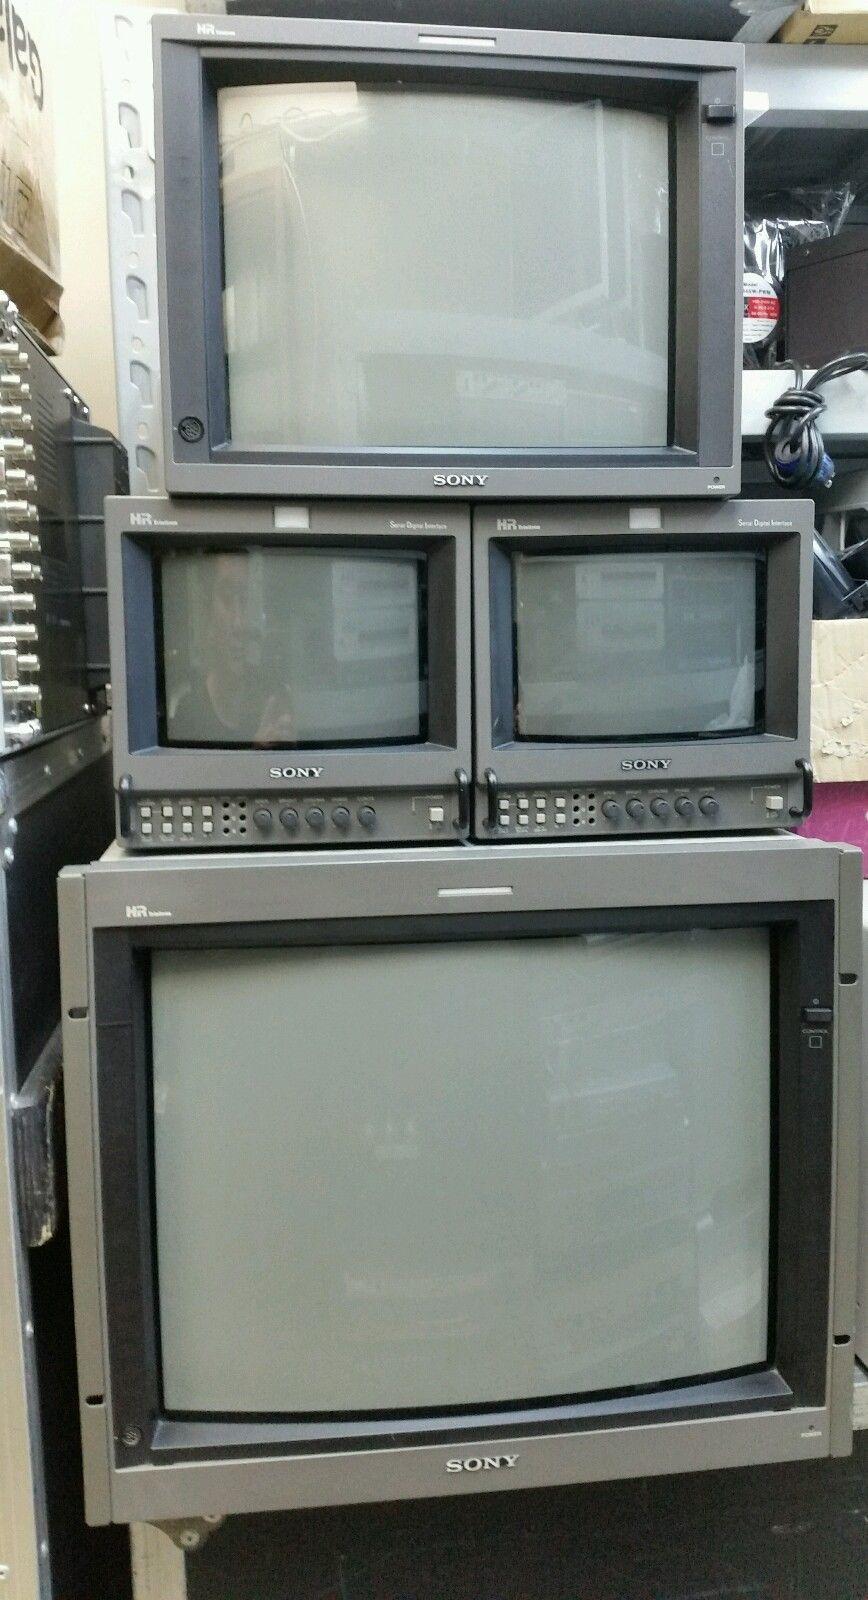 Sony Pvm 20l4 Hr Trinitron Professional Crt Video Monitor Yuv Rgb Sdi Bvm Elektronik